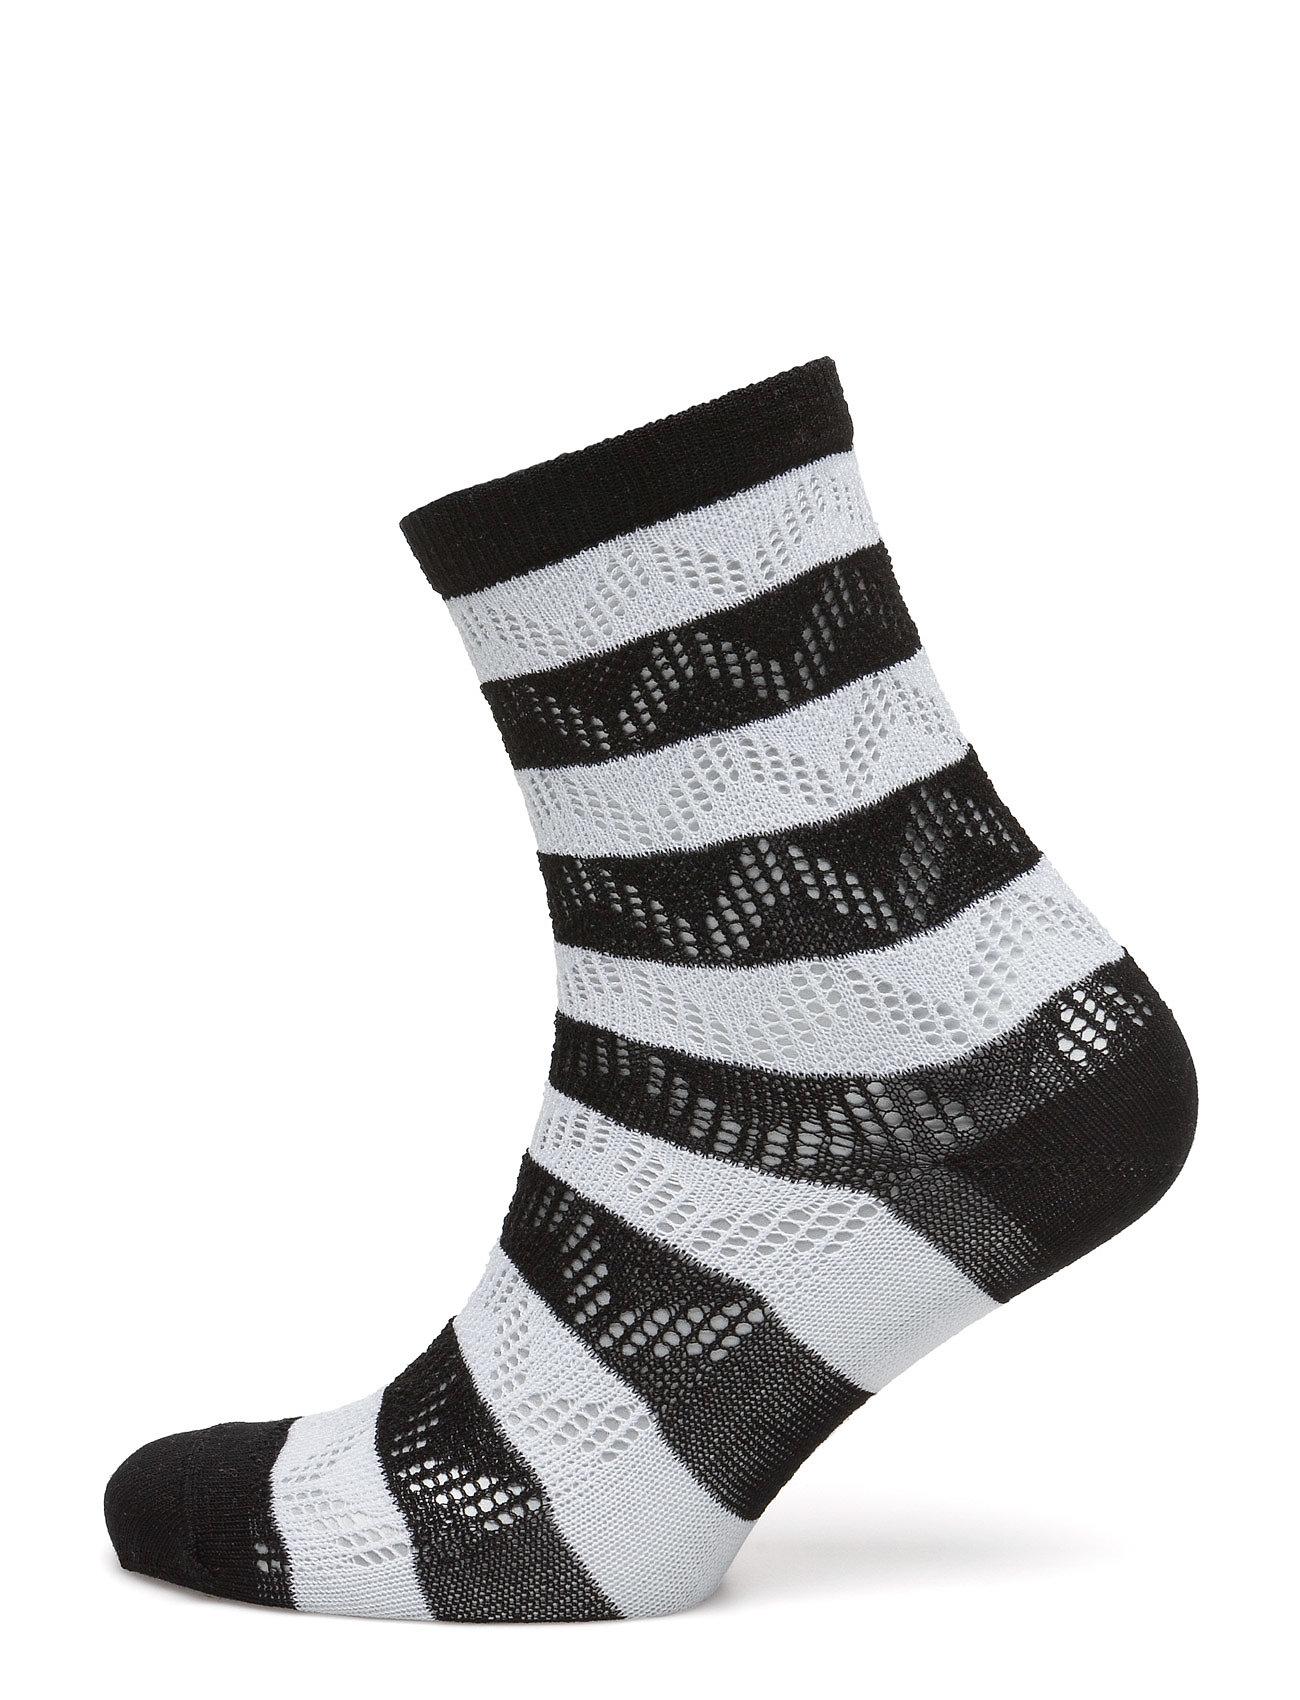 Crochet Stripes Hudson Strømpebukser til Damer i Sort